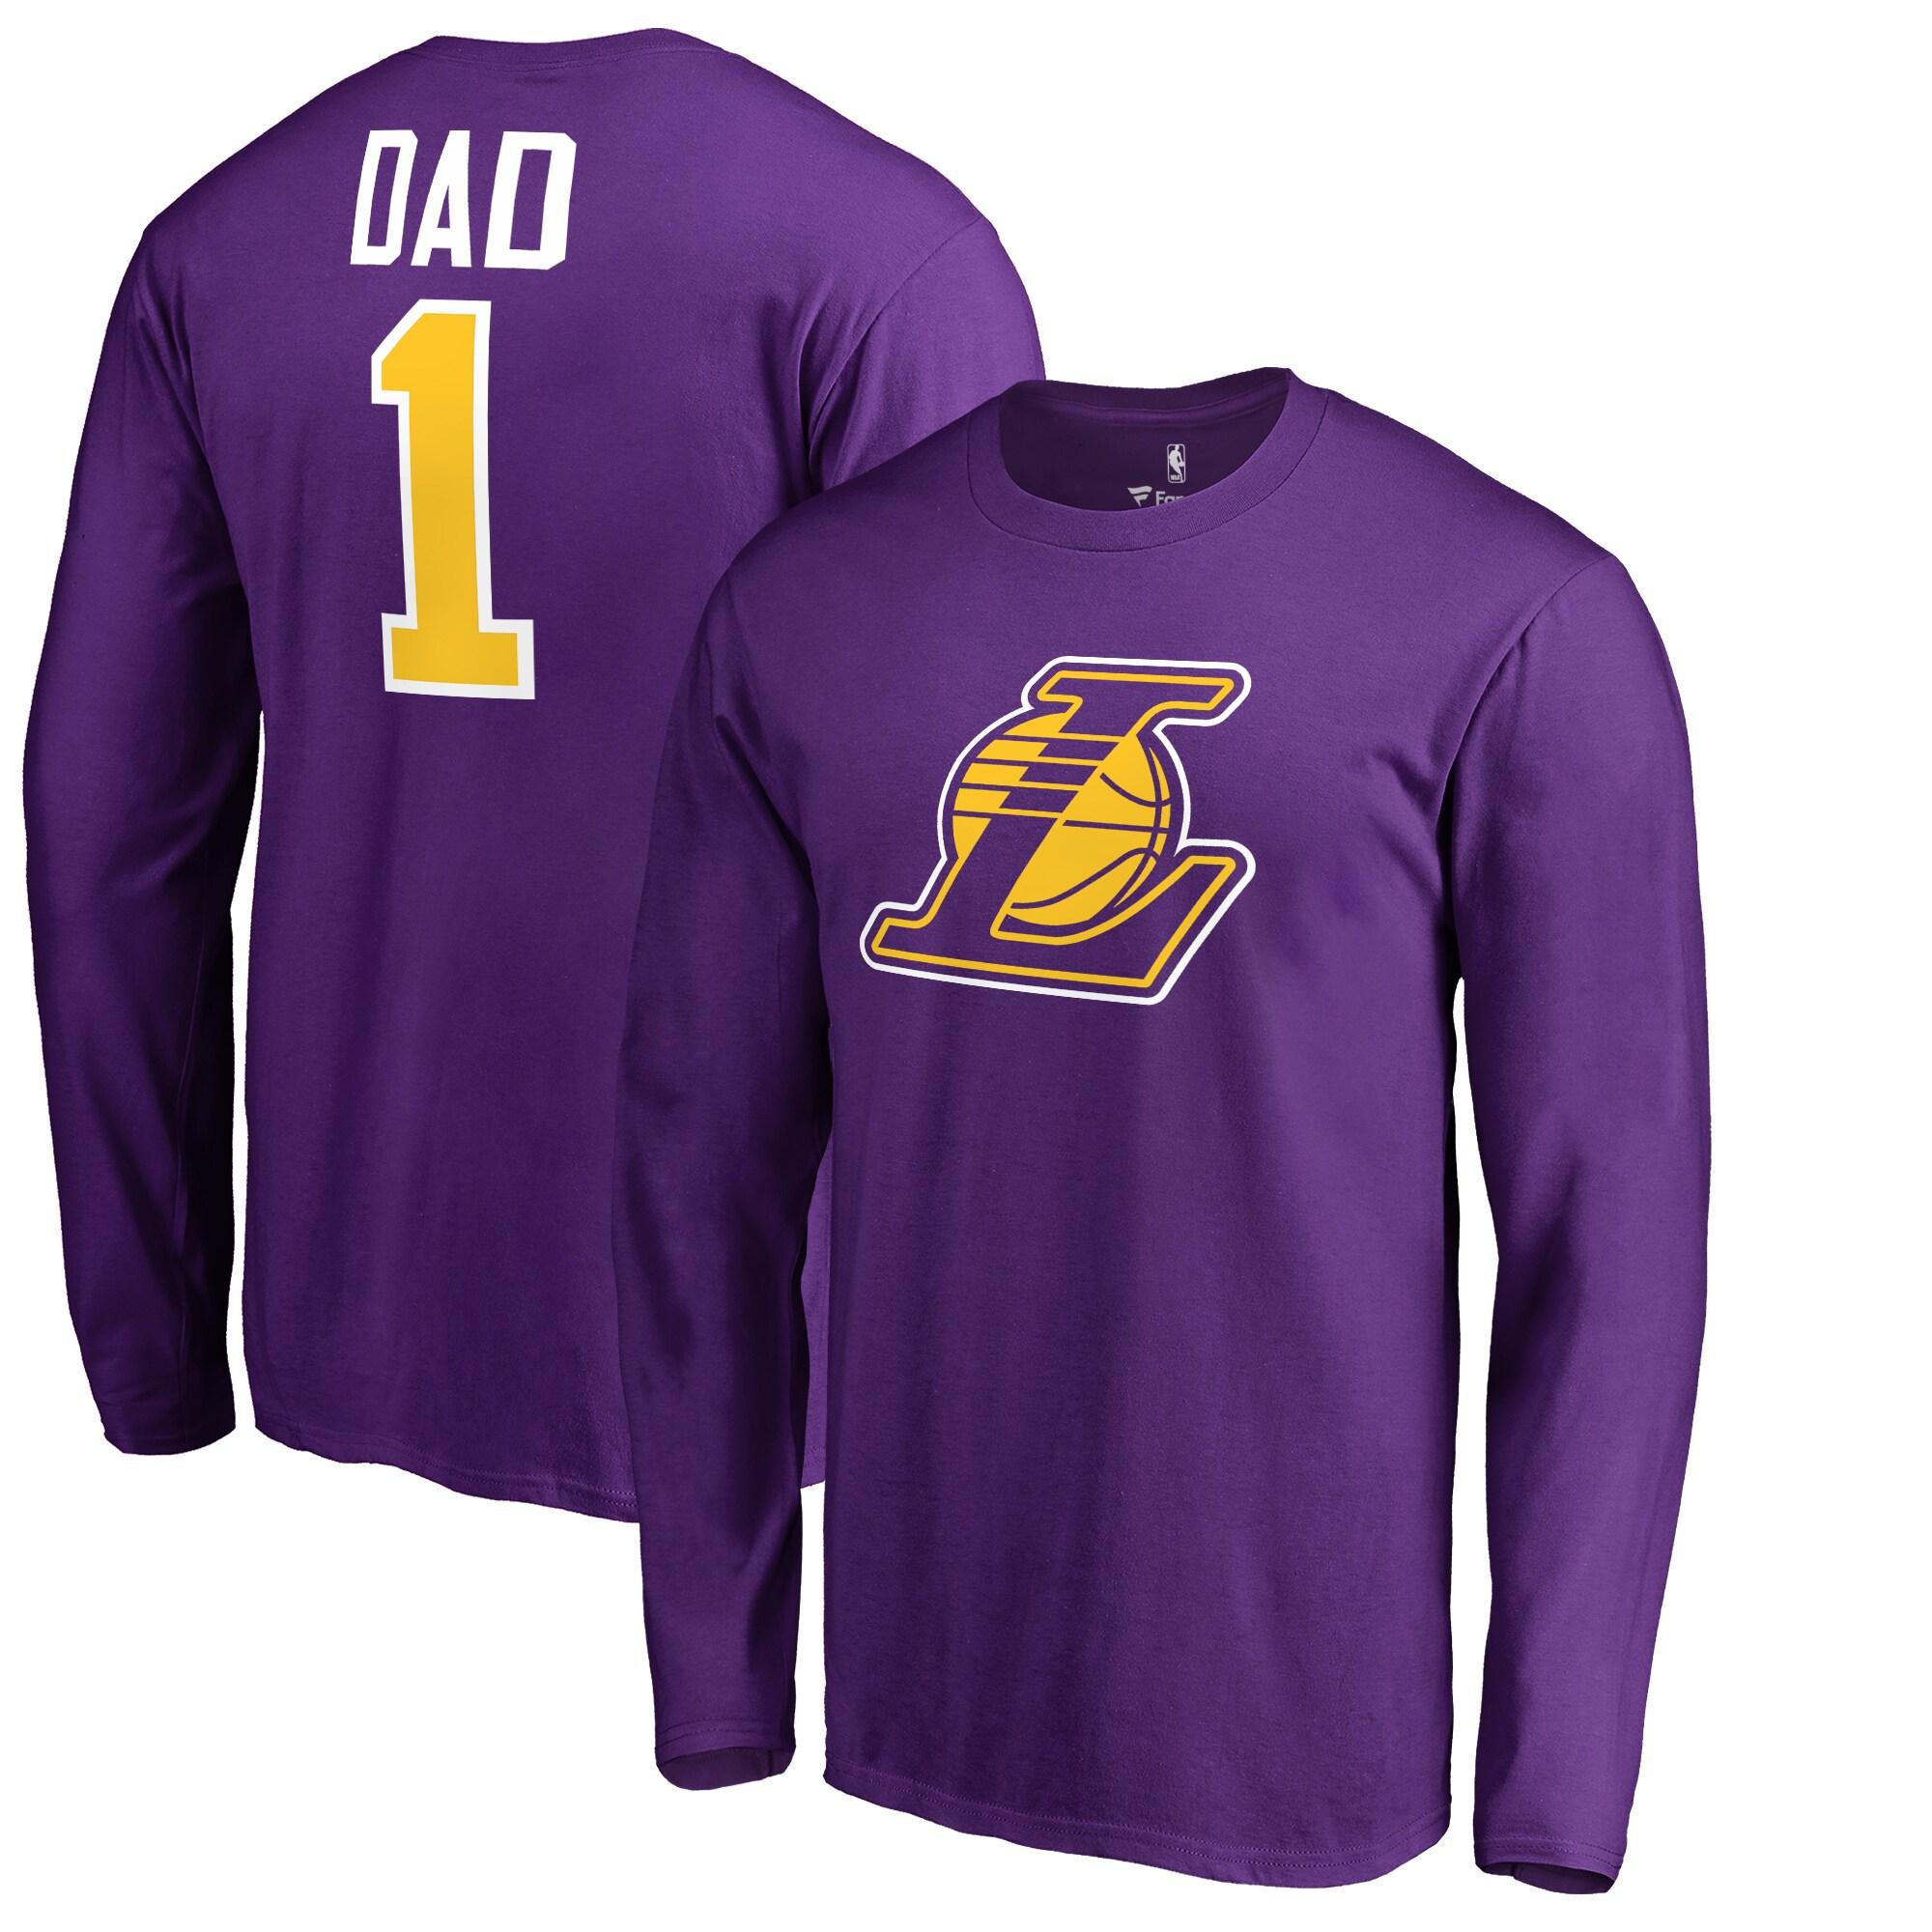 Los Angeles Lakers Fanatics Branded Big & Tall #1 Dad Long Sleeve T-Shirt - Purple